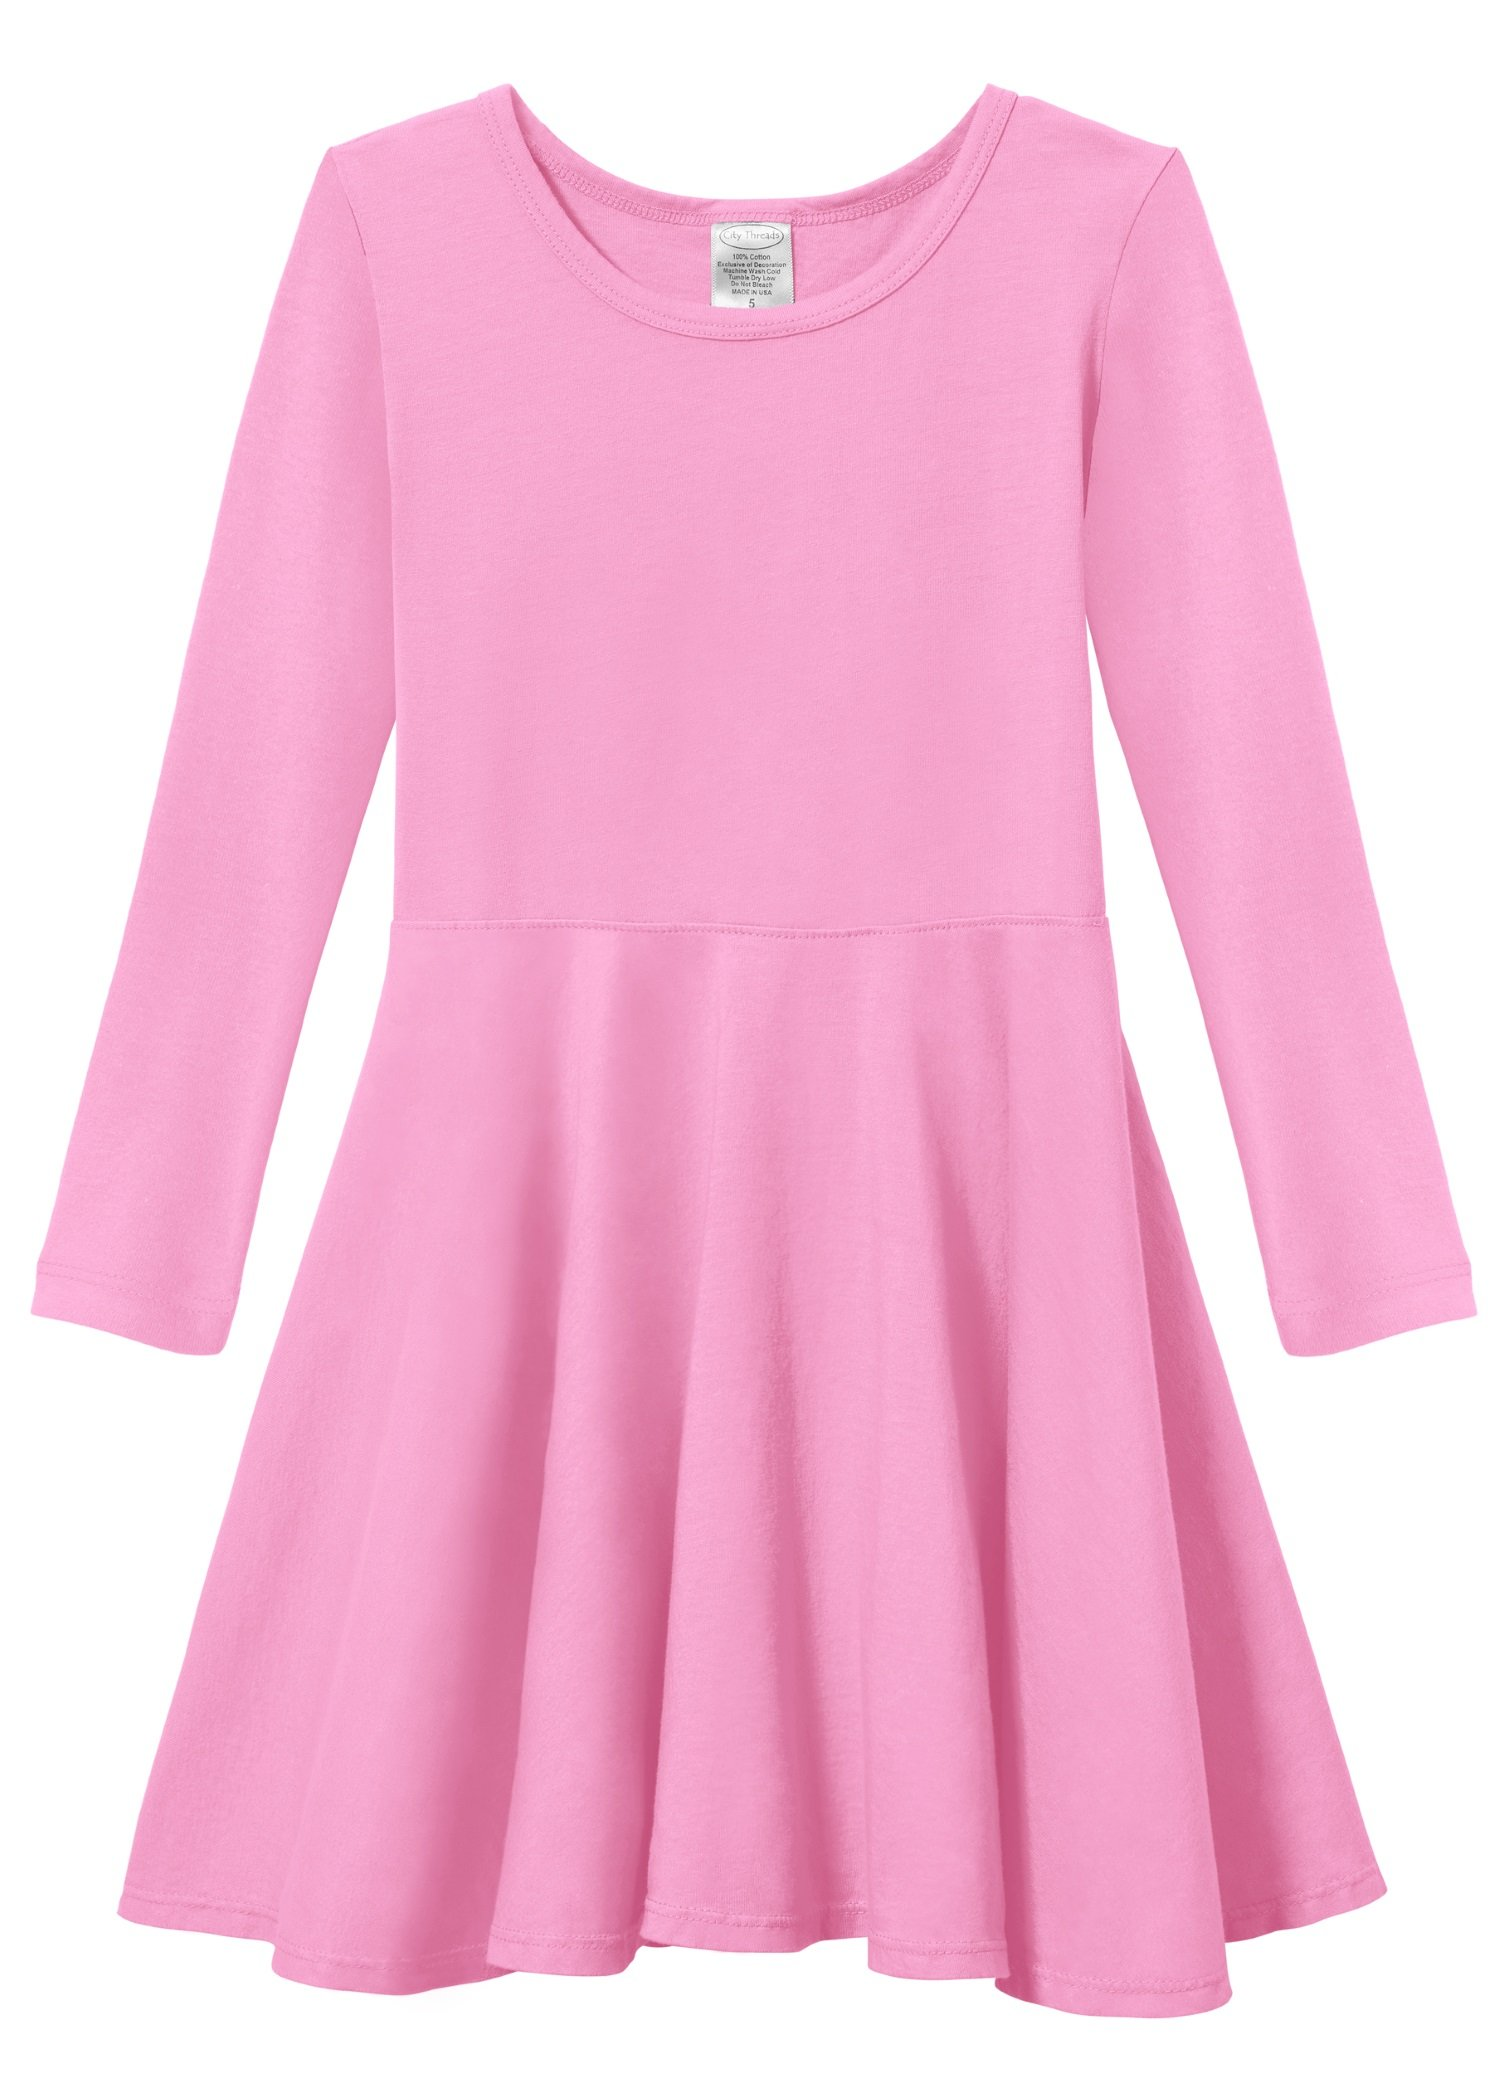 City Threads Little Girls' Super Soft Cotton Long Sleeve Twirly Skater Party Dress, Medium Pink, 4T